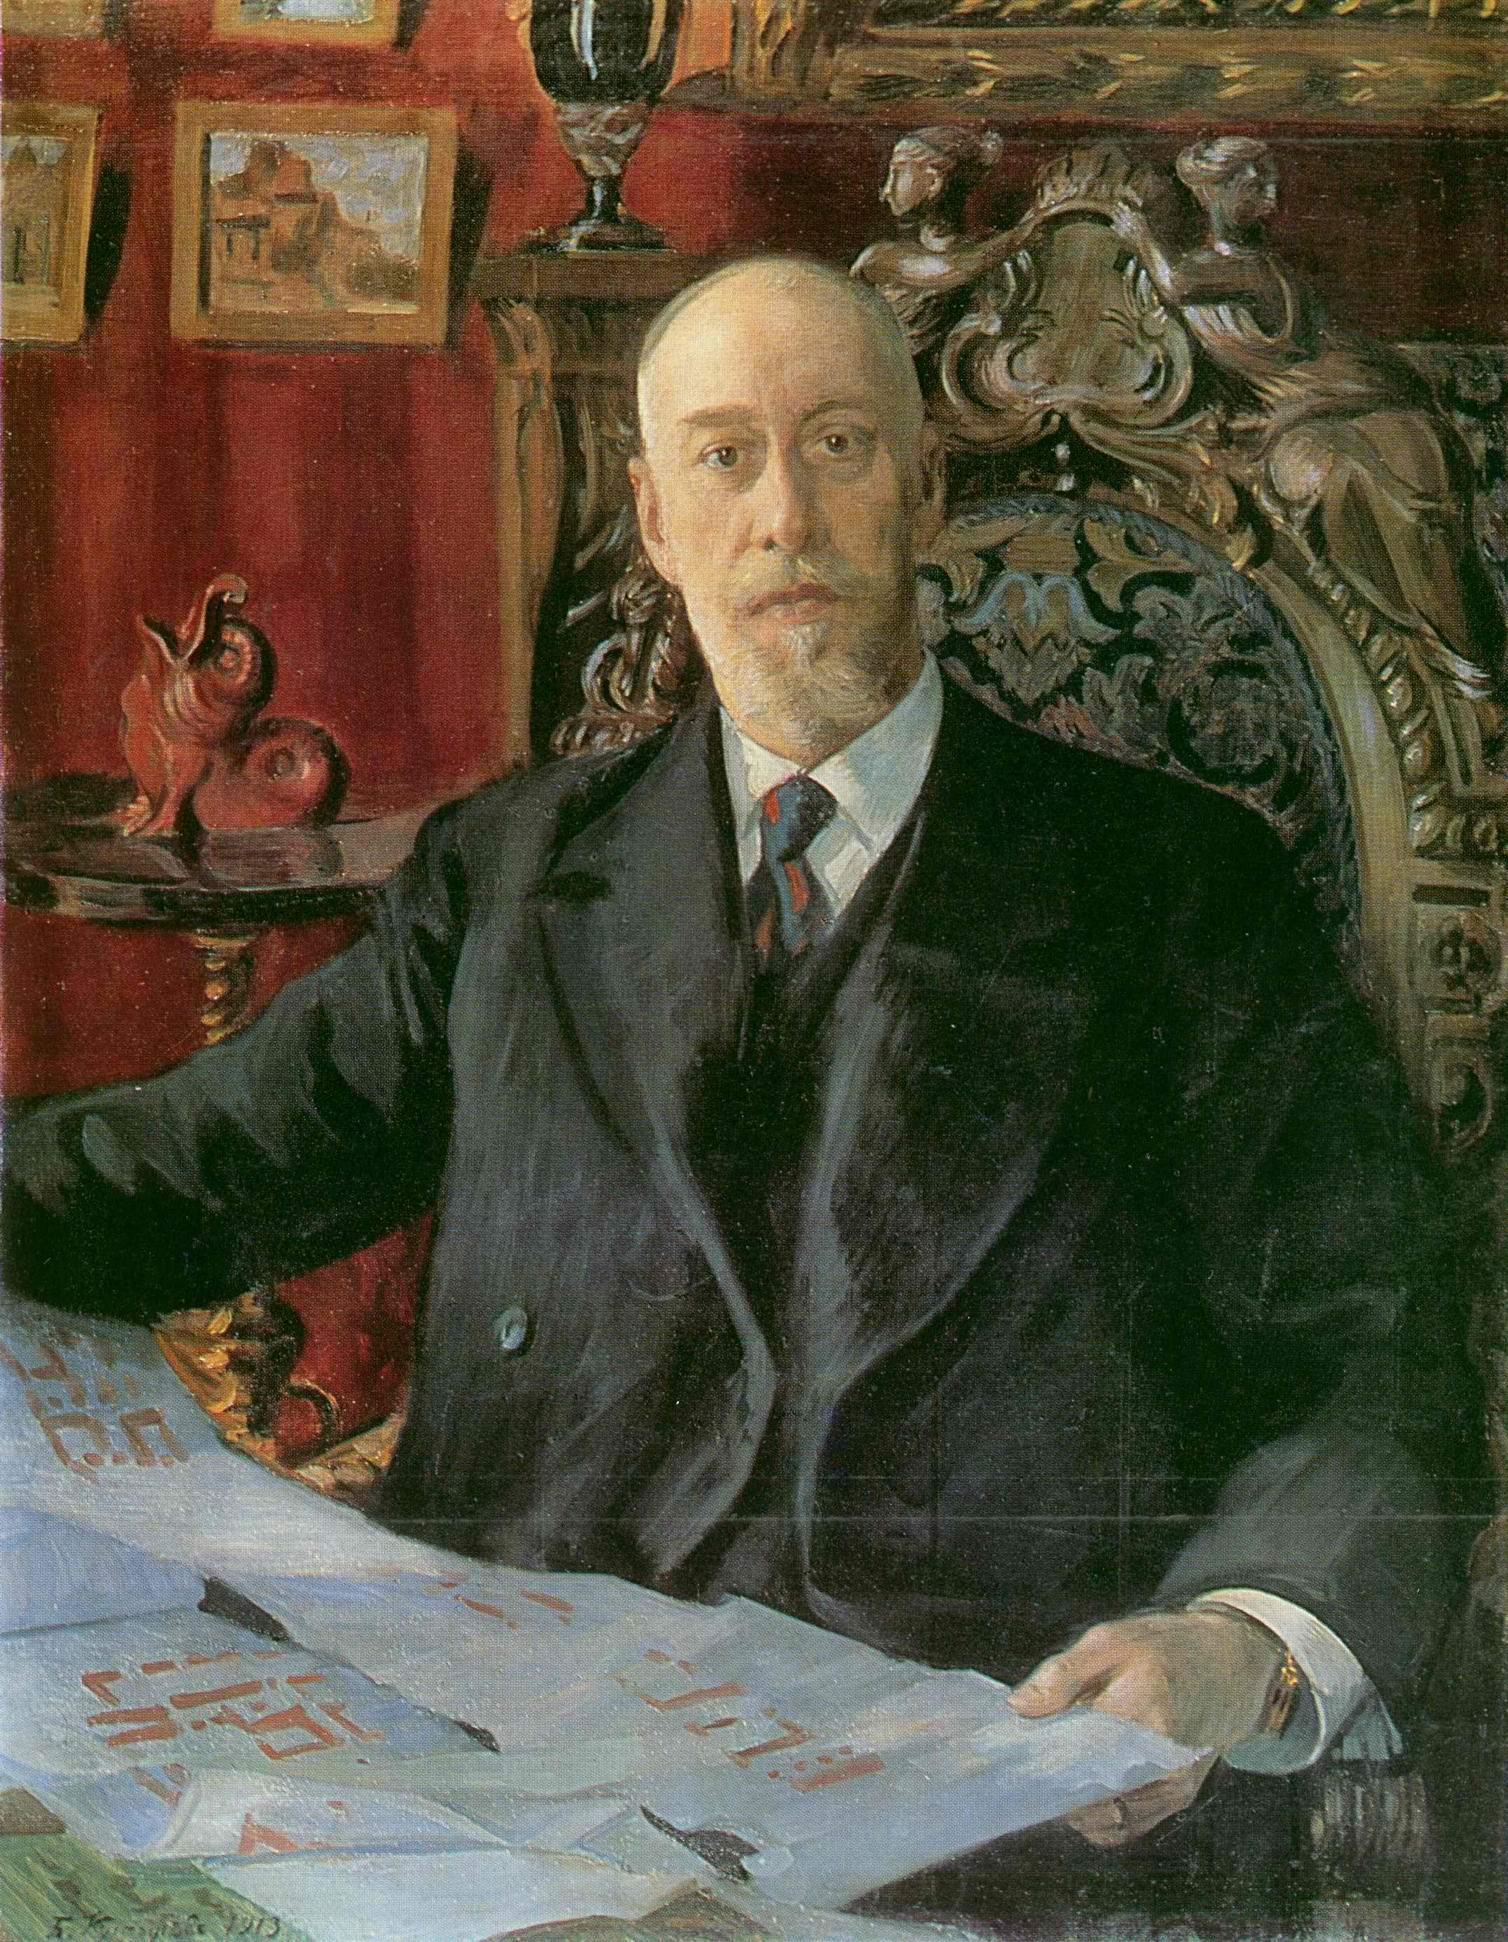 Портрет Николая Карловича фон Мекка, Кустодиев Борис Михайлович